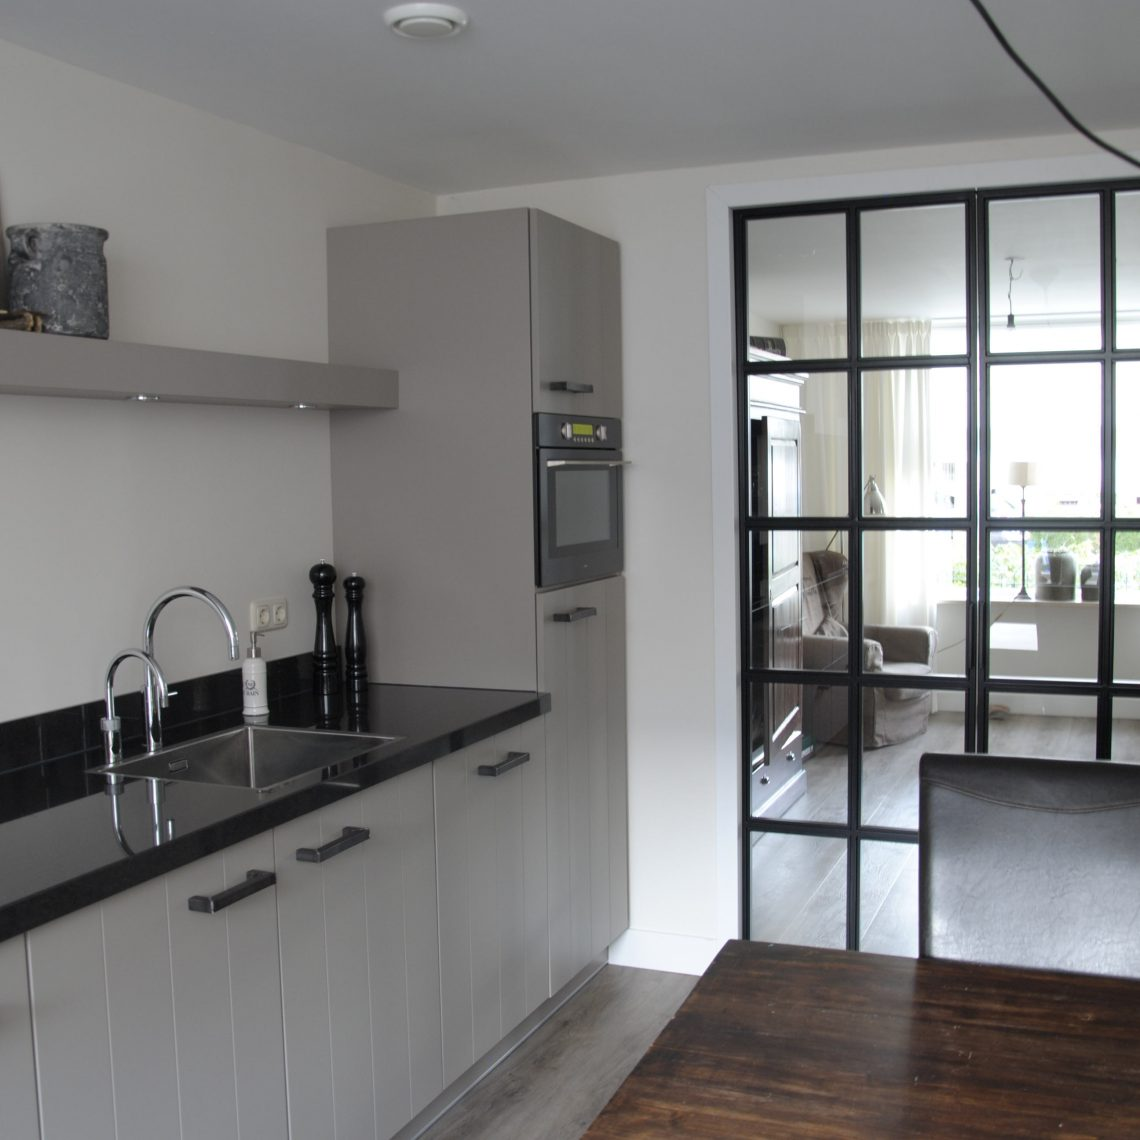 Landelijk moderne keuken elspeet keukenhof sliedrecht for Slaapkamer landelijk modern